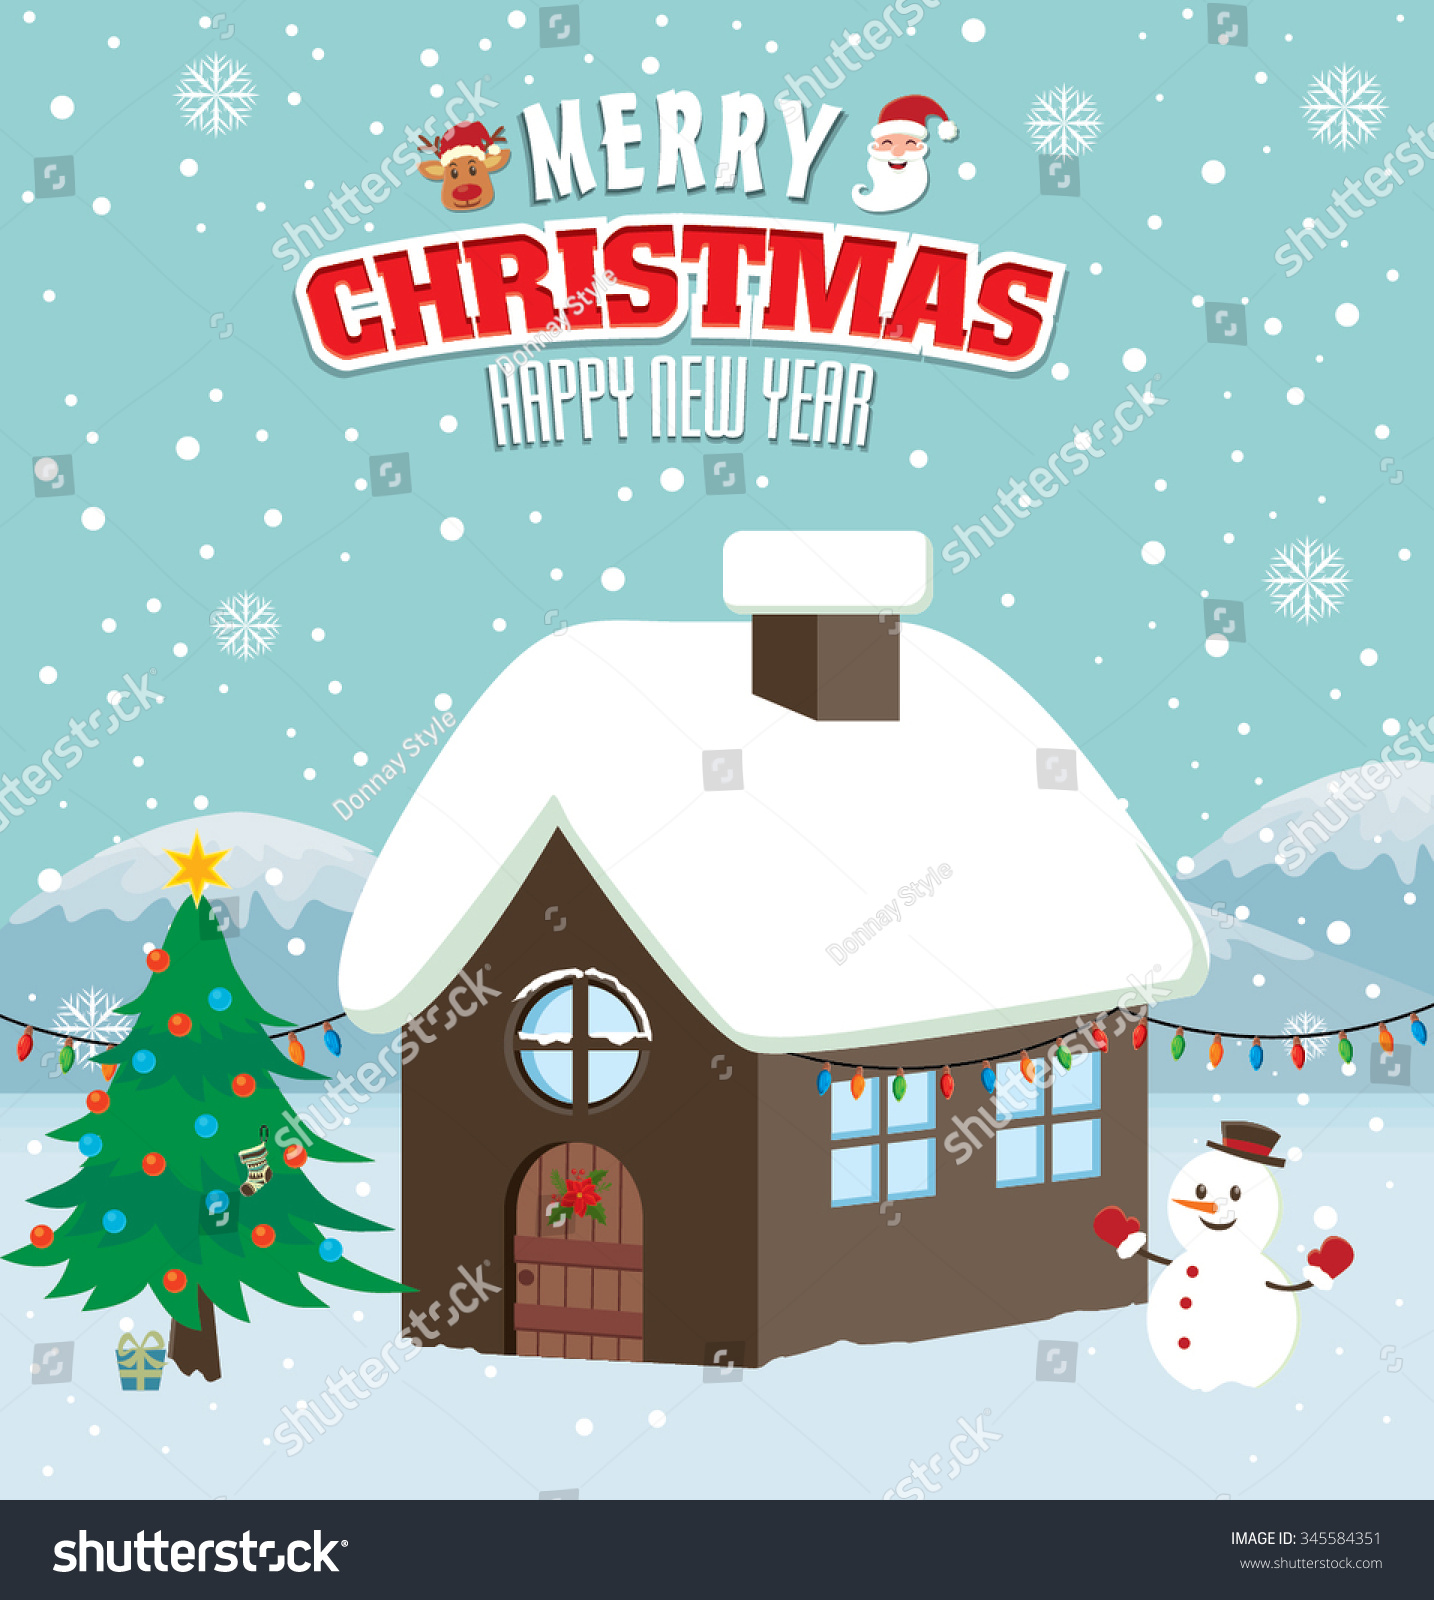 Xmas poster design - Vintage Christmas Poster Design